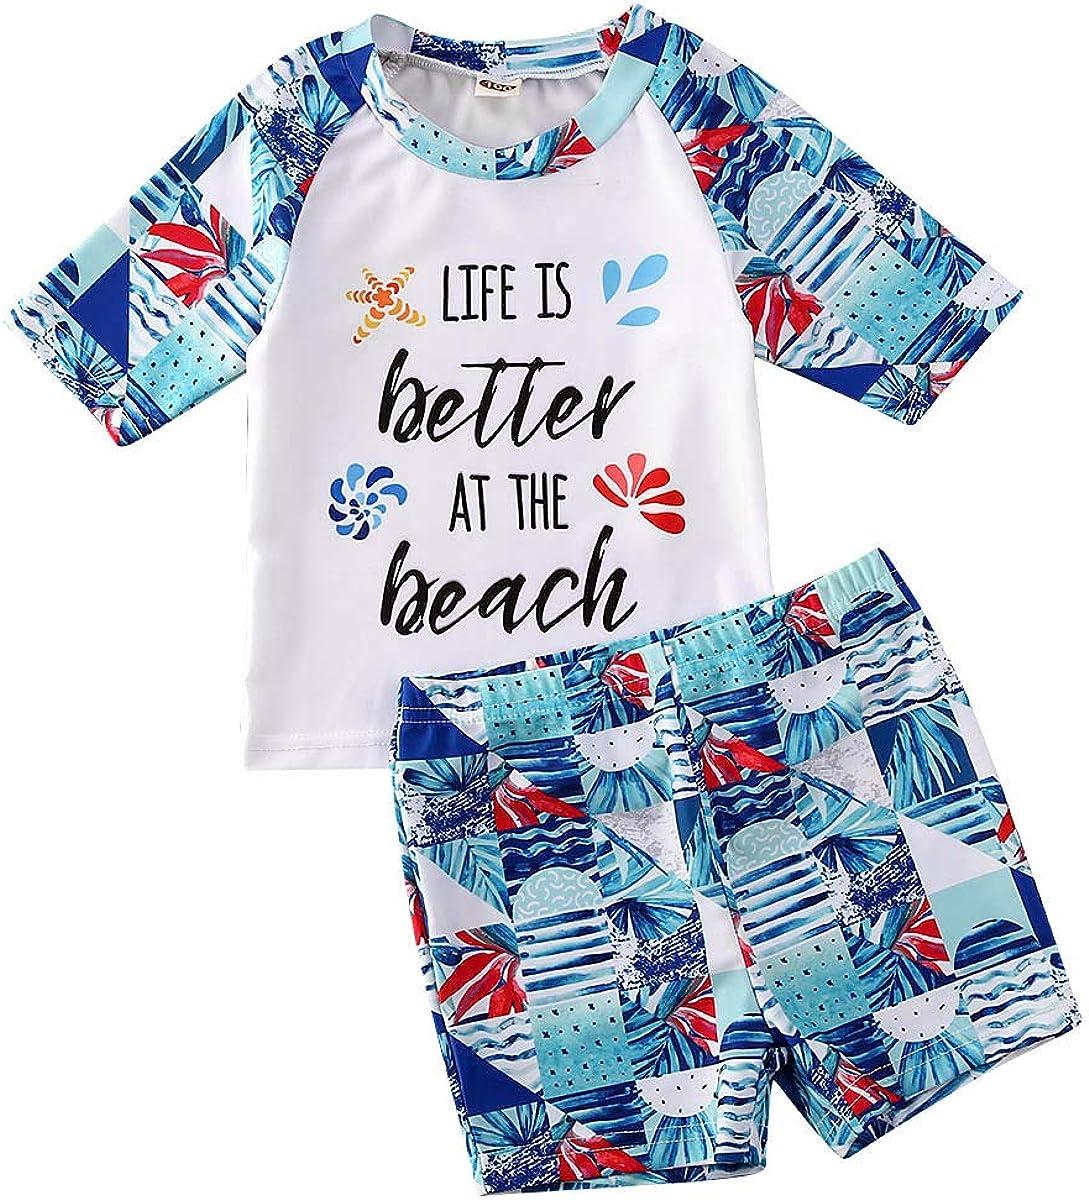 MSDMSASD Toddler Baby Boy Swimsuit 3-Piece Dinosaur Pattern Short Sleeve Top Quick Dry Drawstring Shorts with Hat